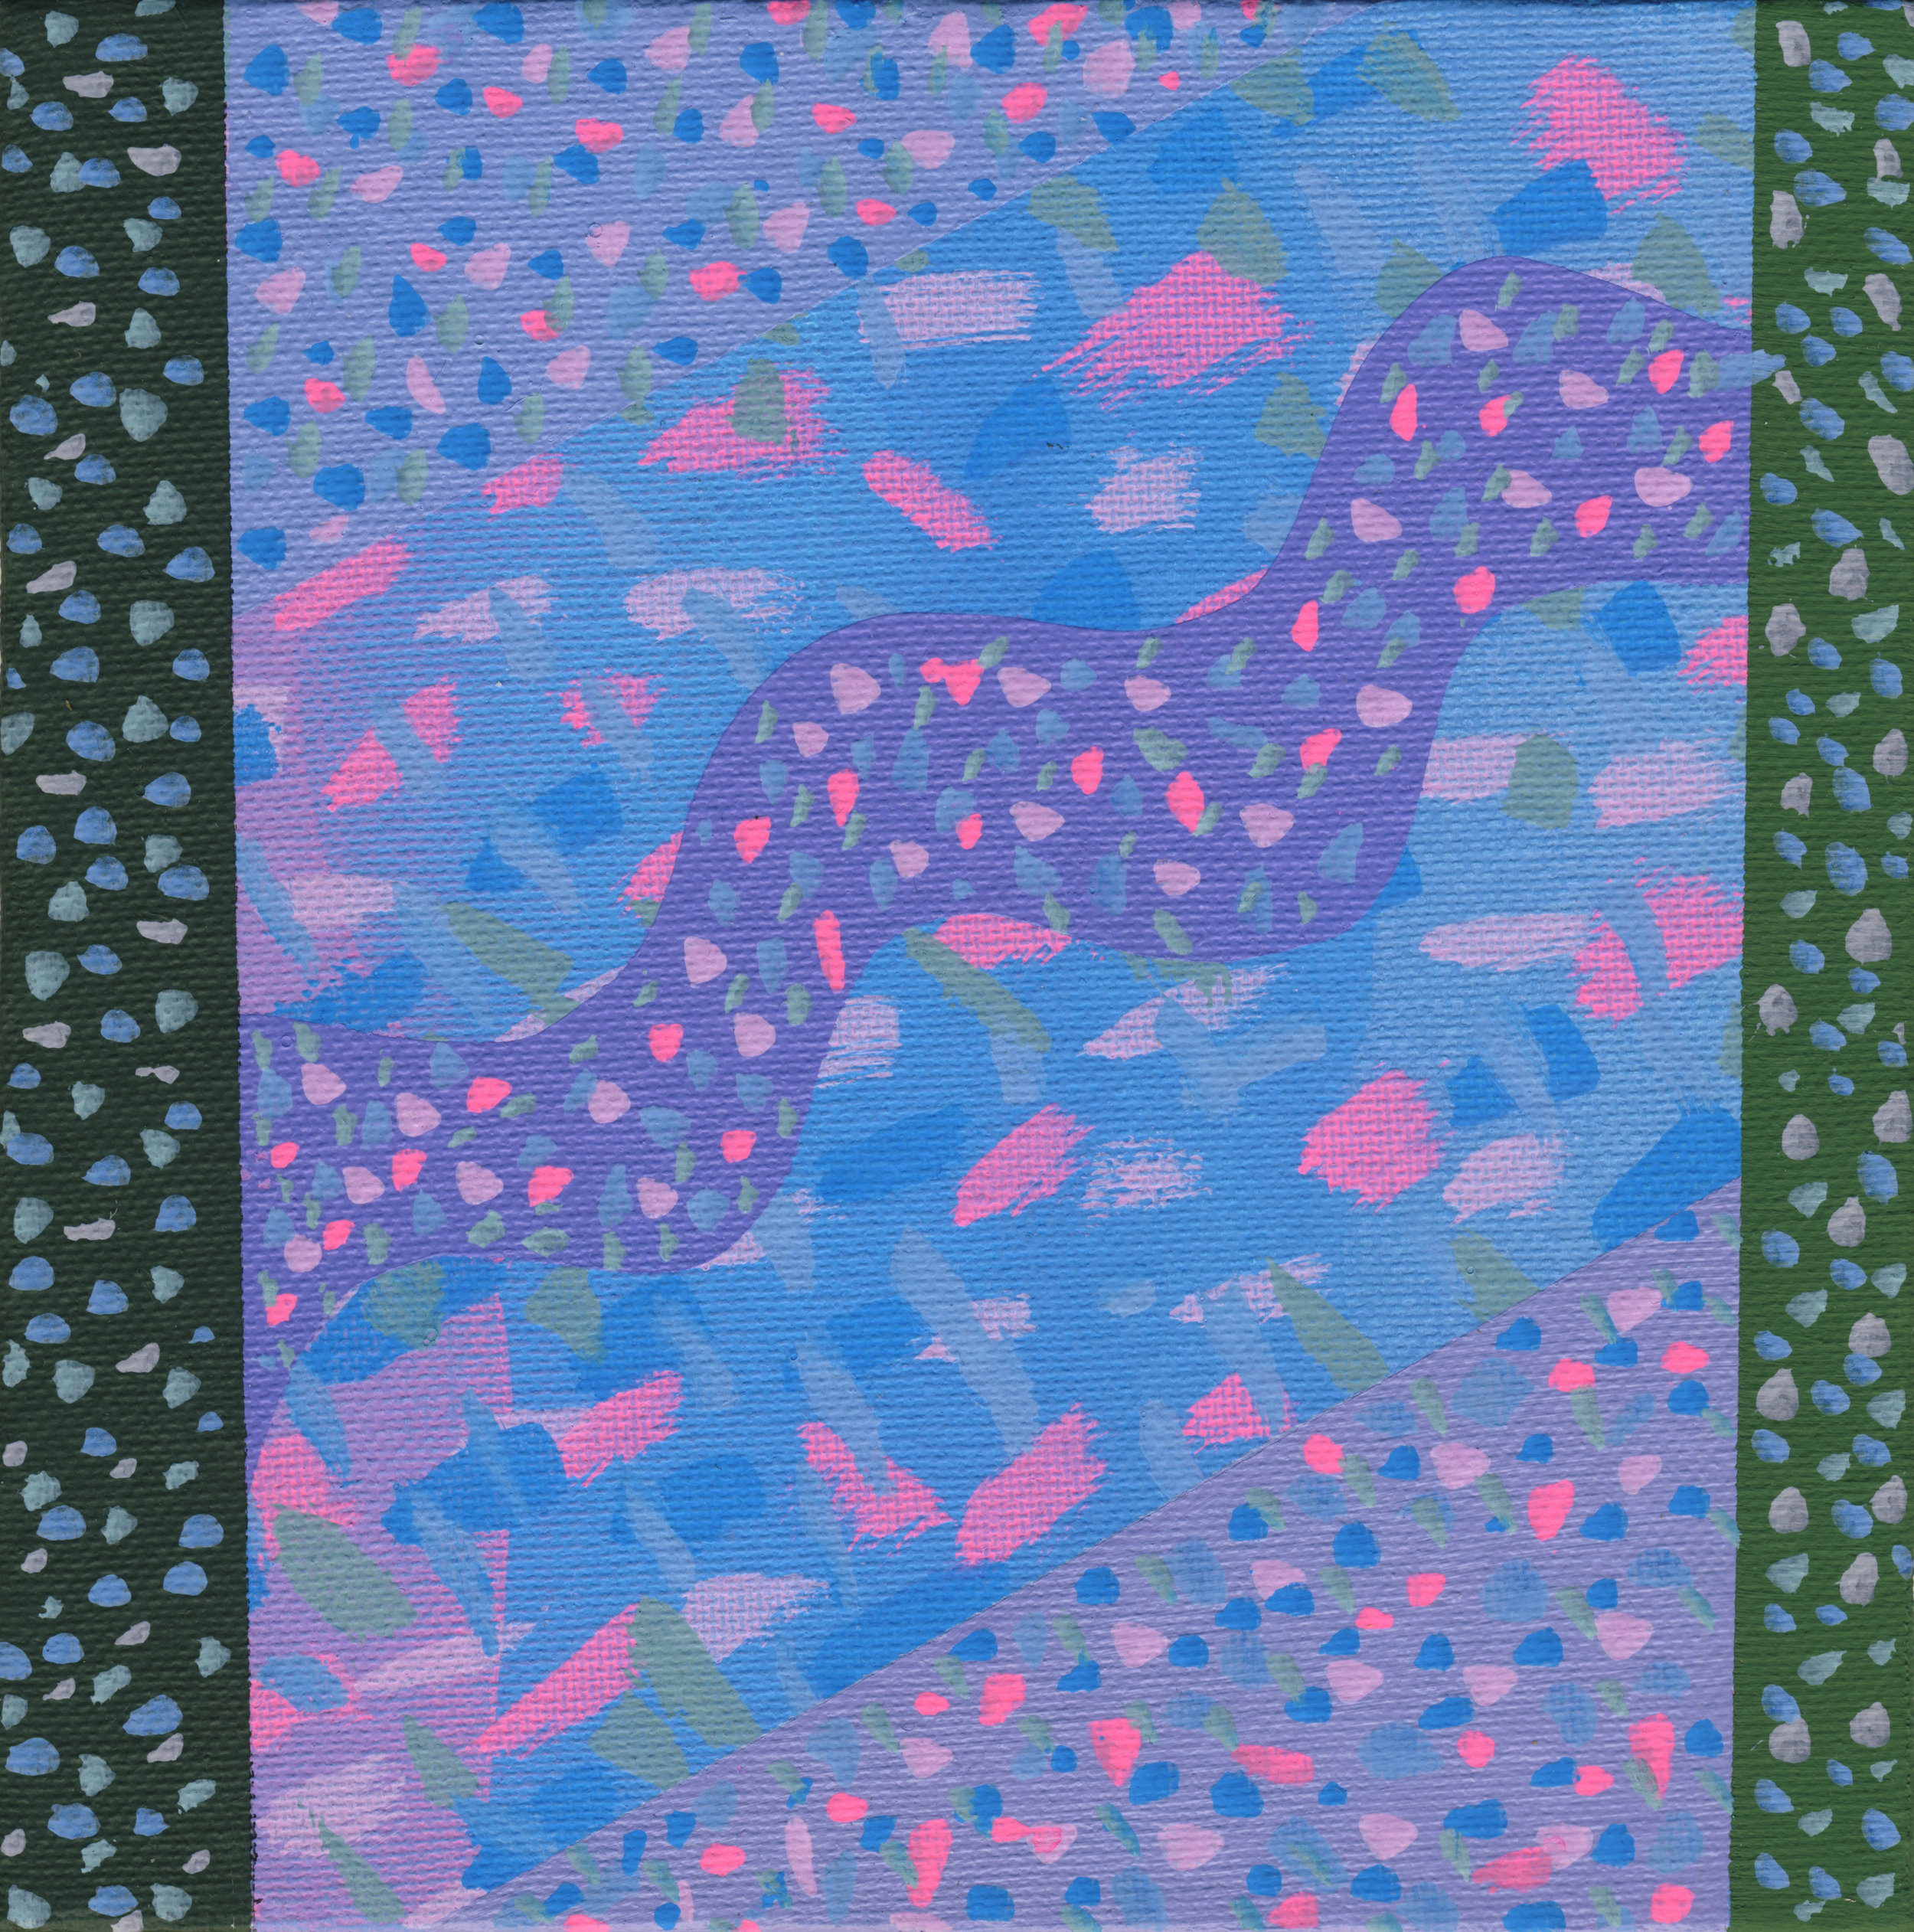 "13/100, Acrylic on canvas panel, 6"" X 6"", 1/19/19"